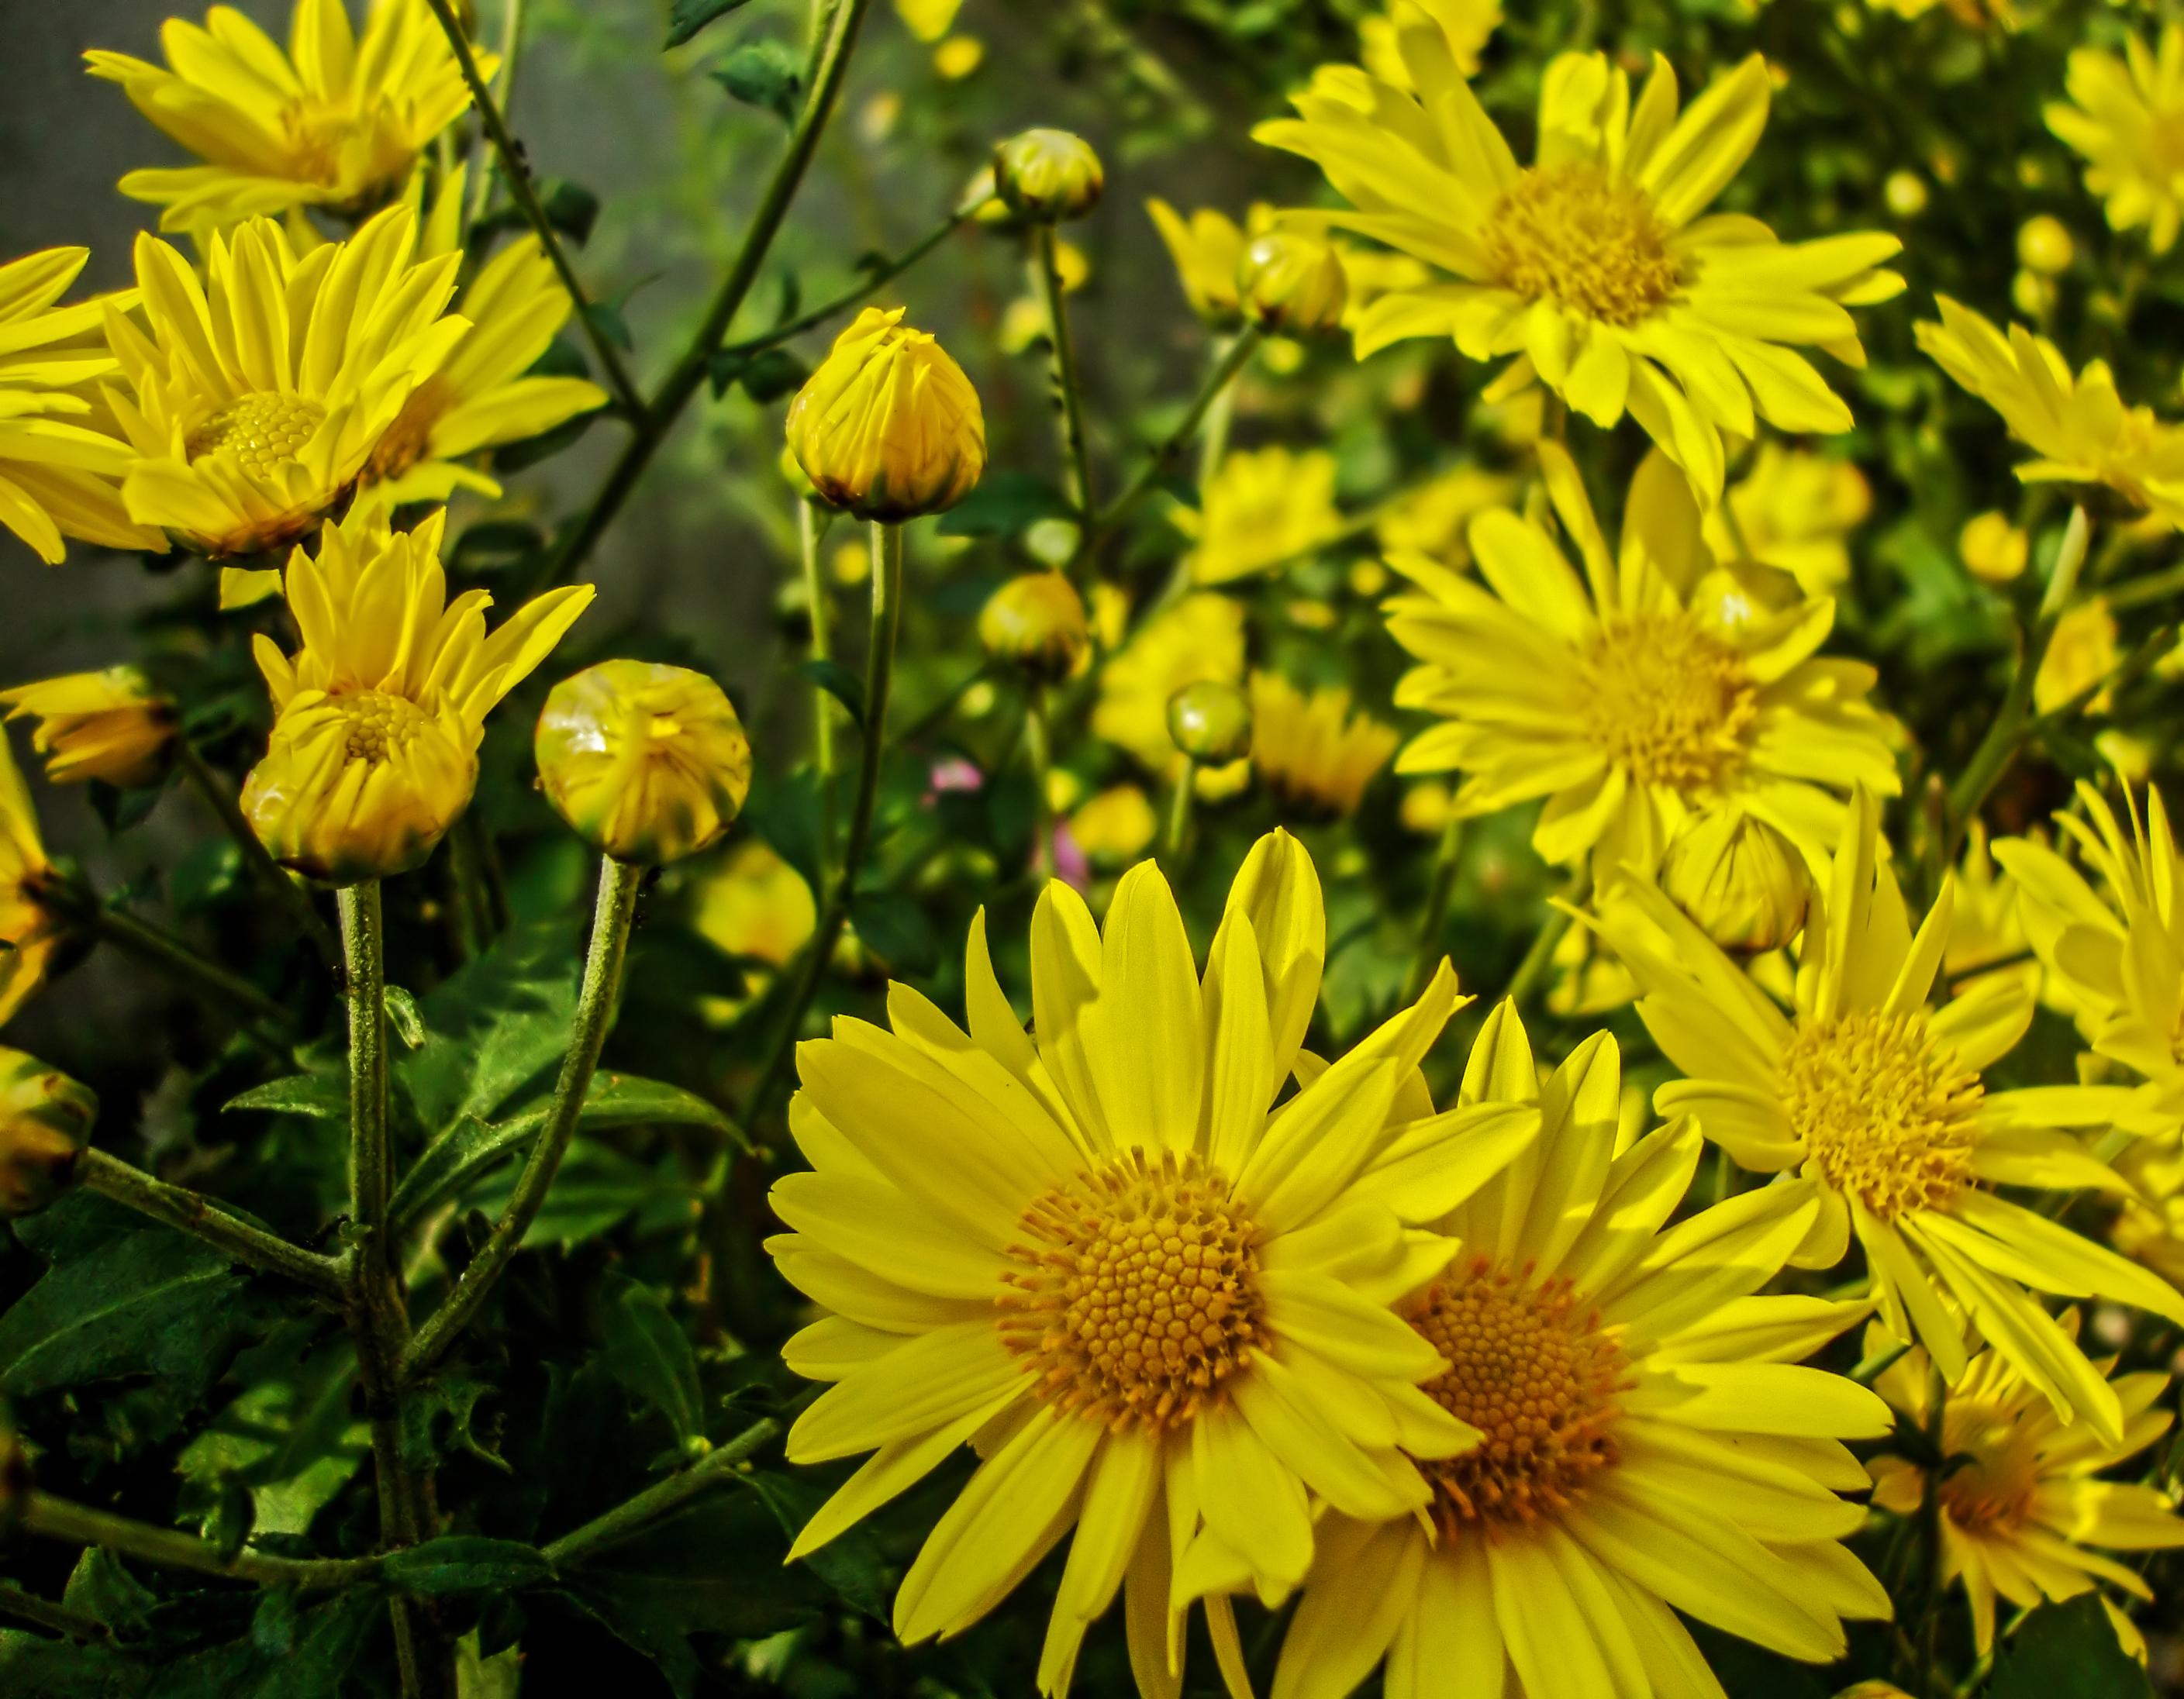 Berühmt File:Chrysanthemum indicum 17122010.jpg - Wikimedia Commons &VA_84